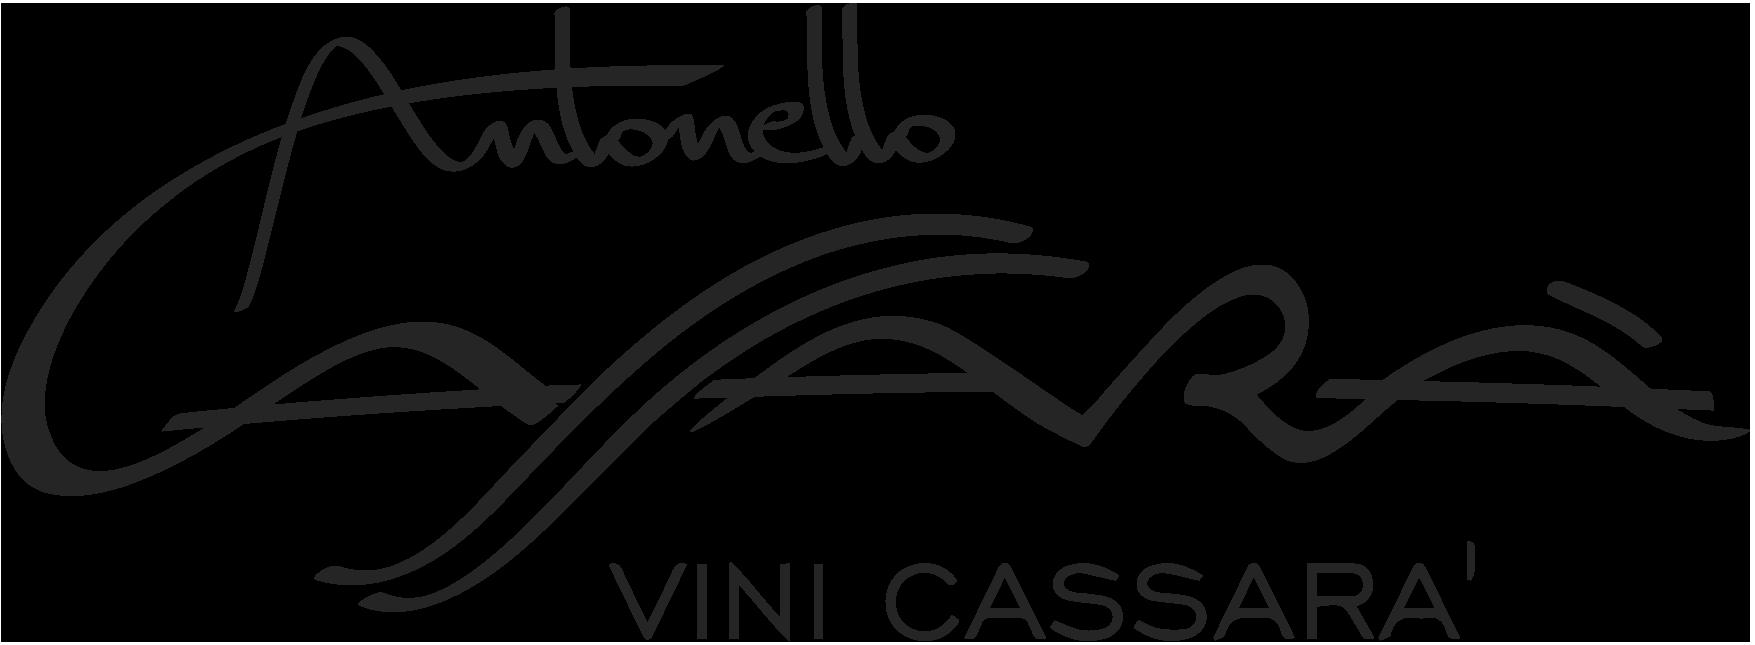 vinicassara